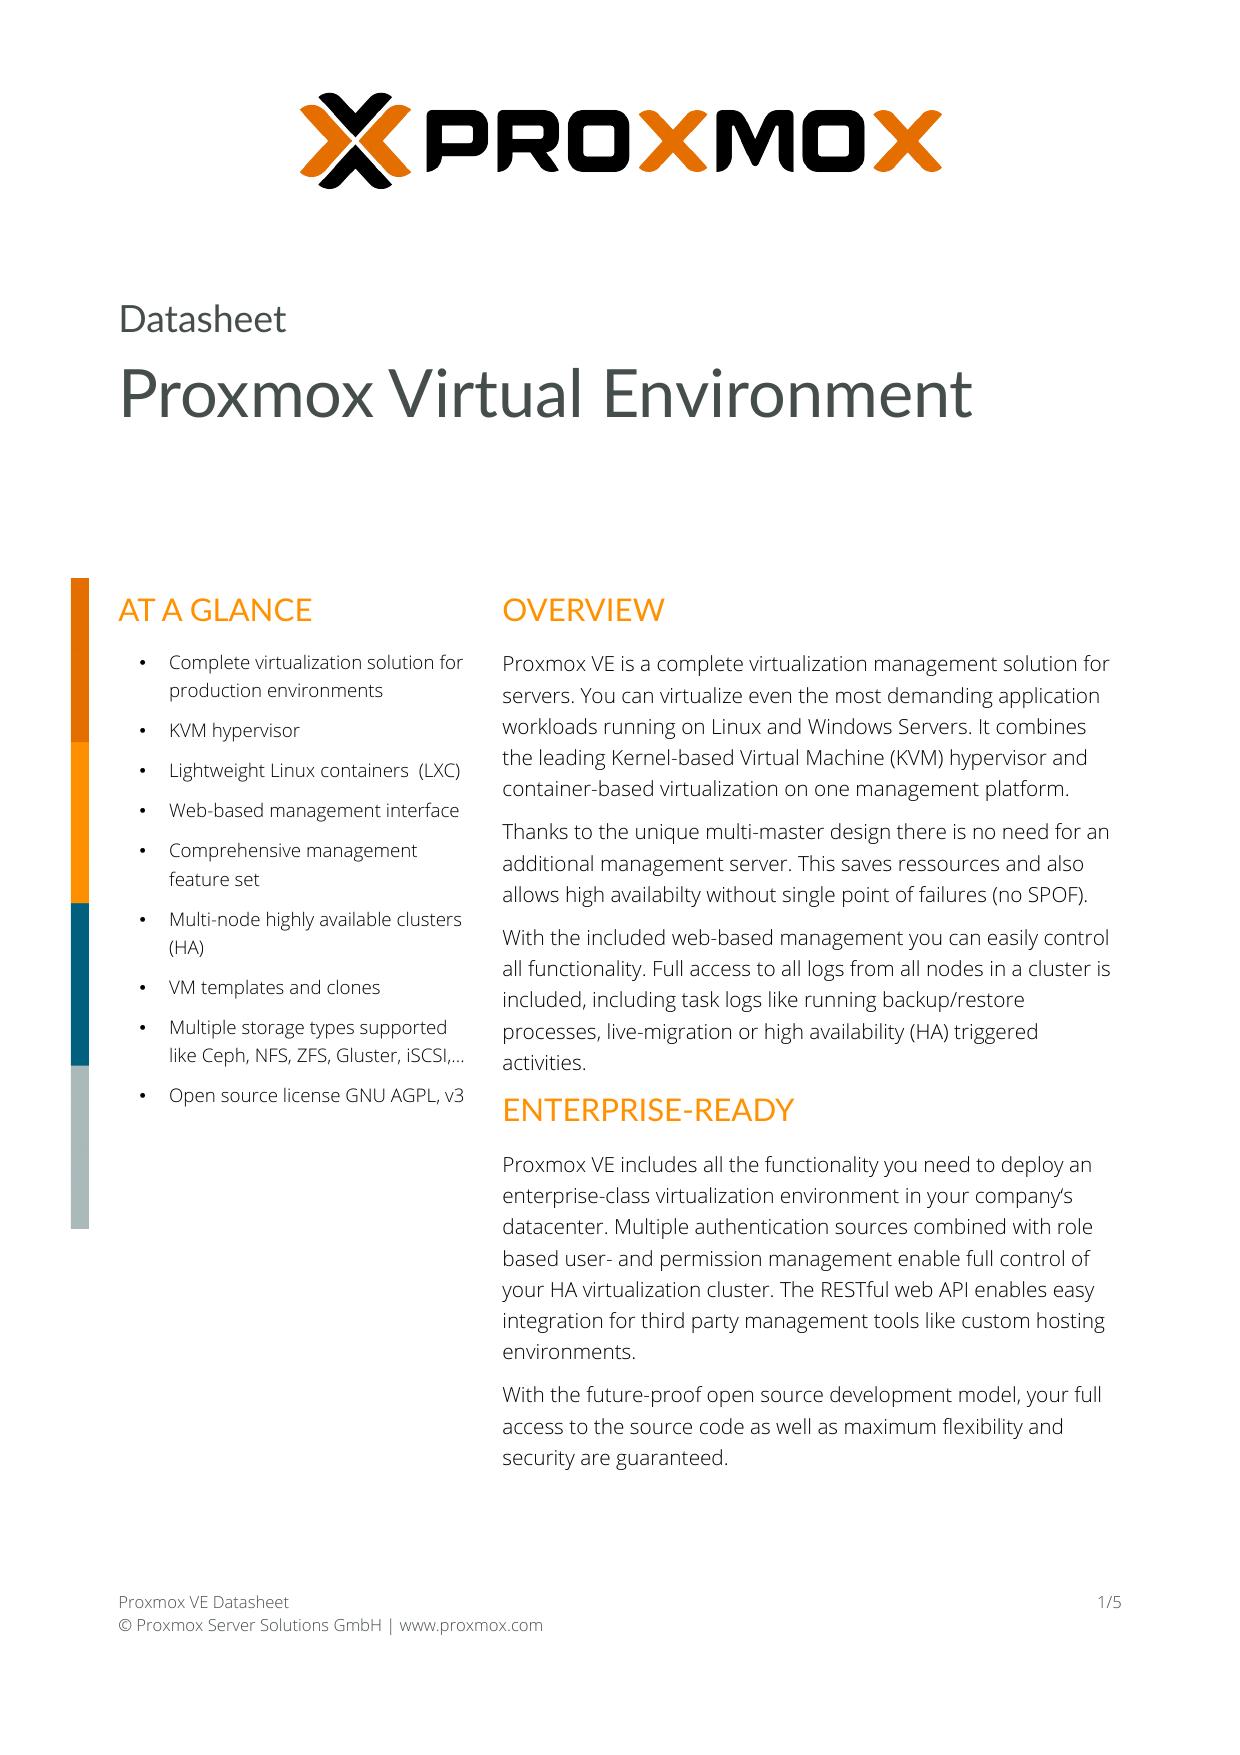 Proxmox Mail Gateway Datasheet | manualzz com